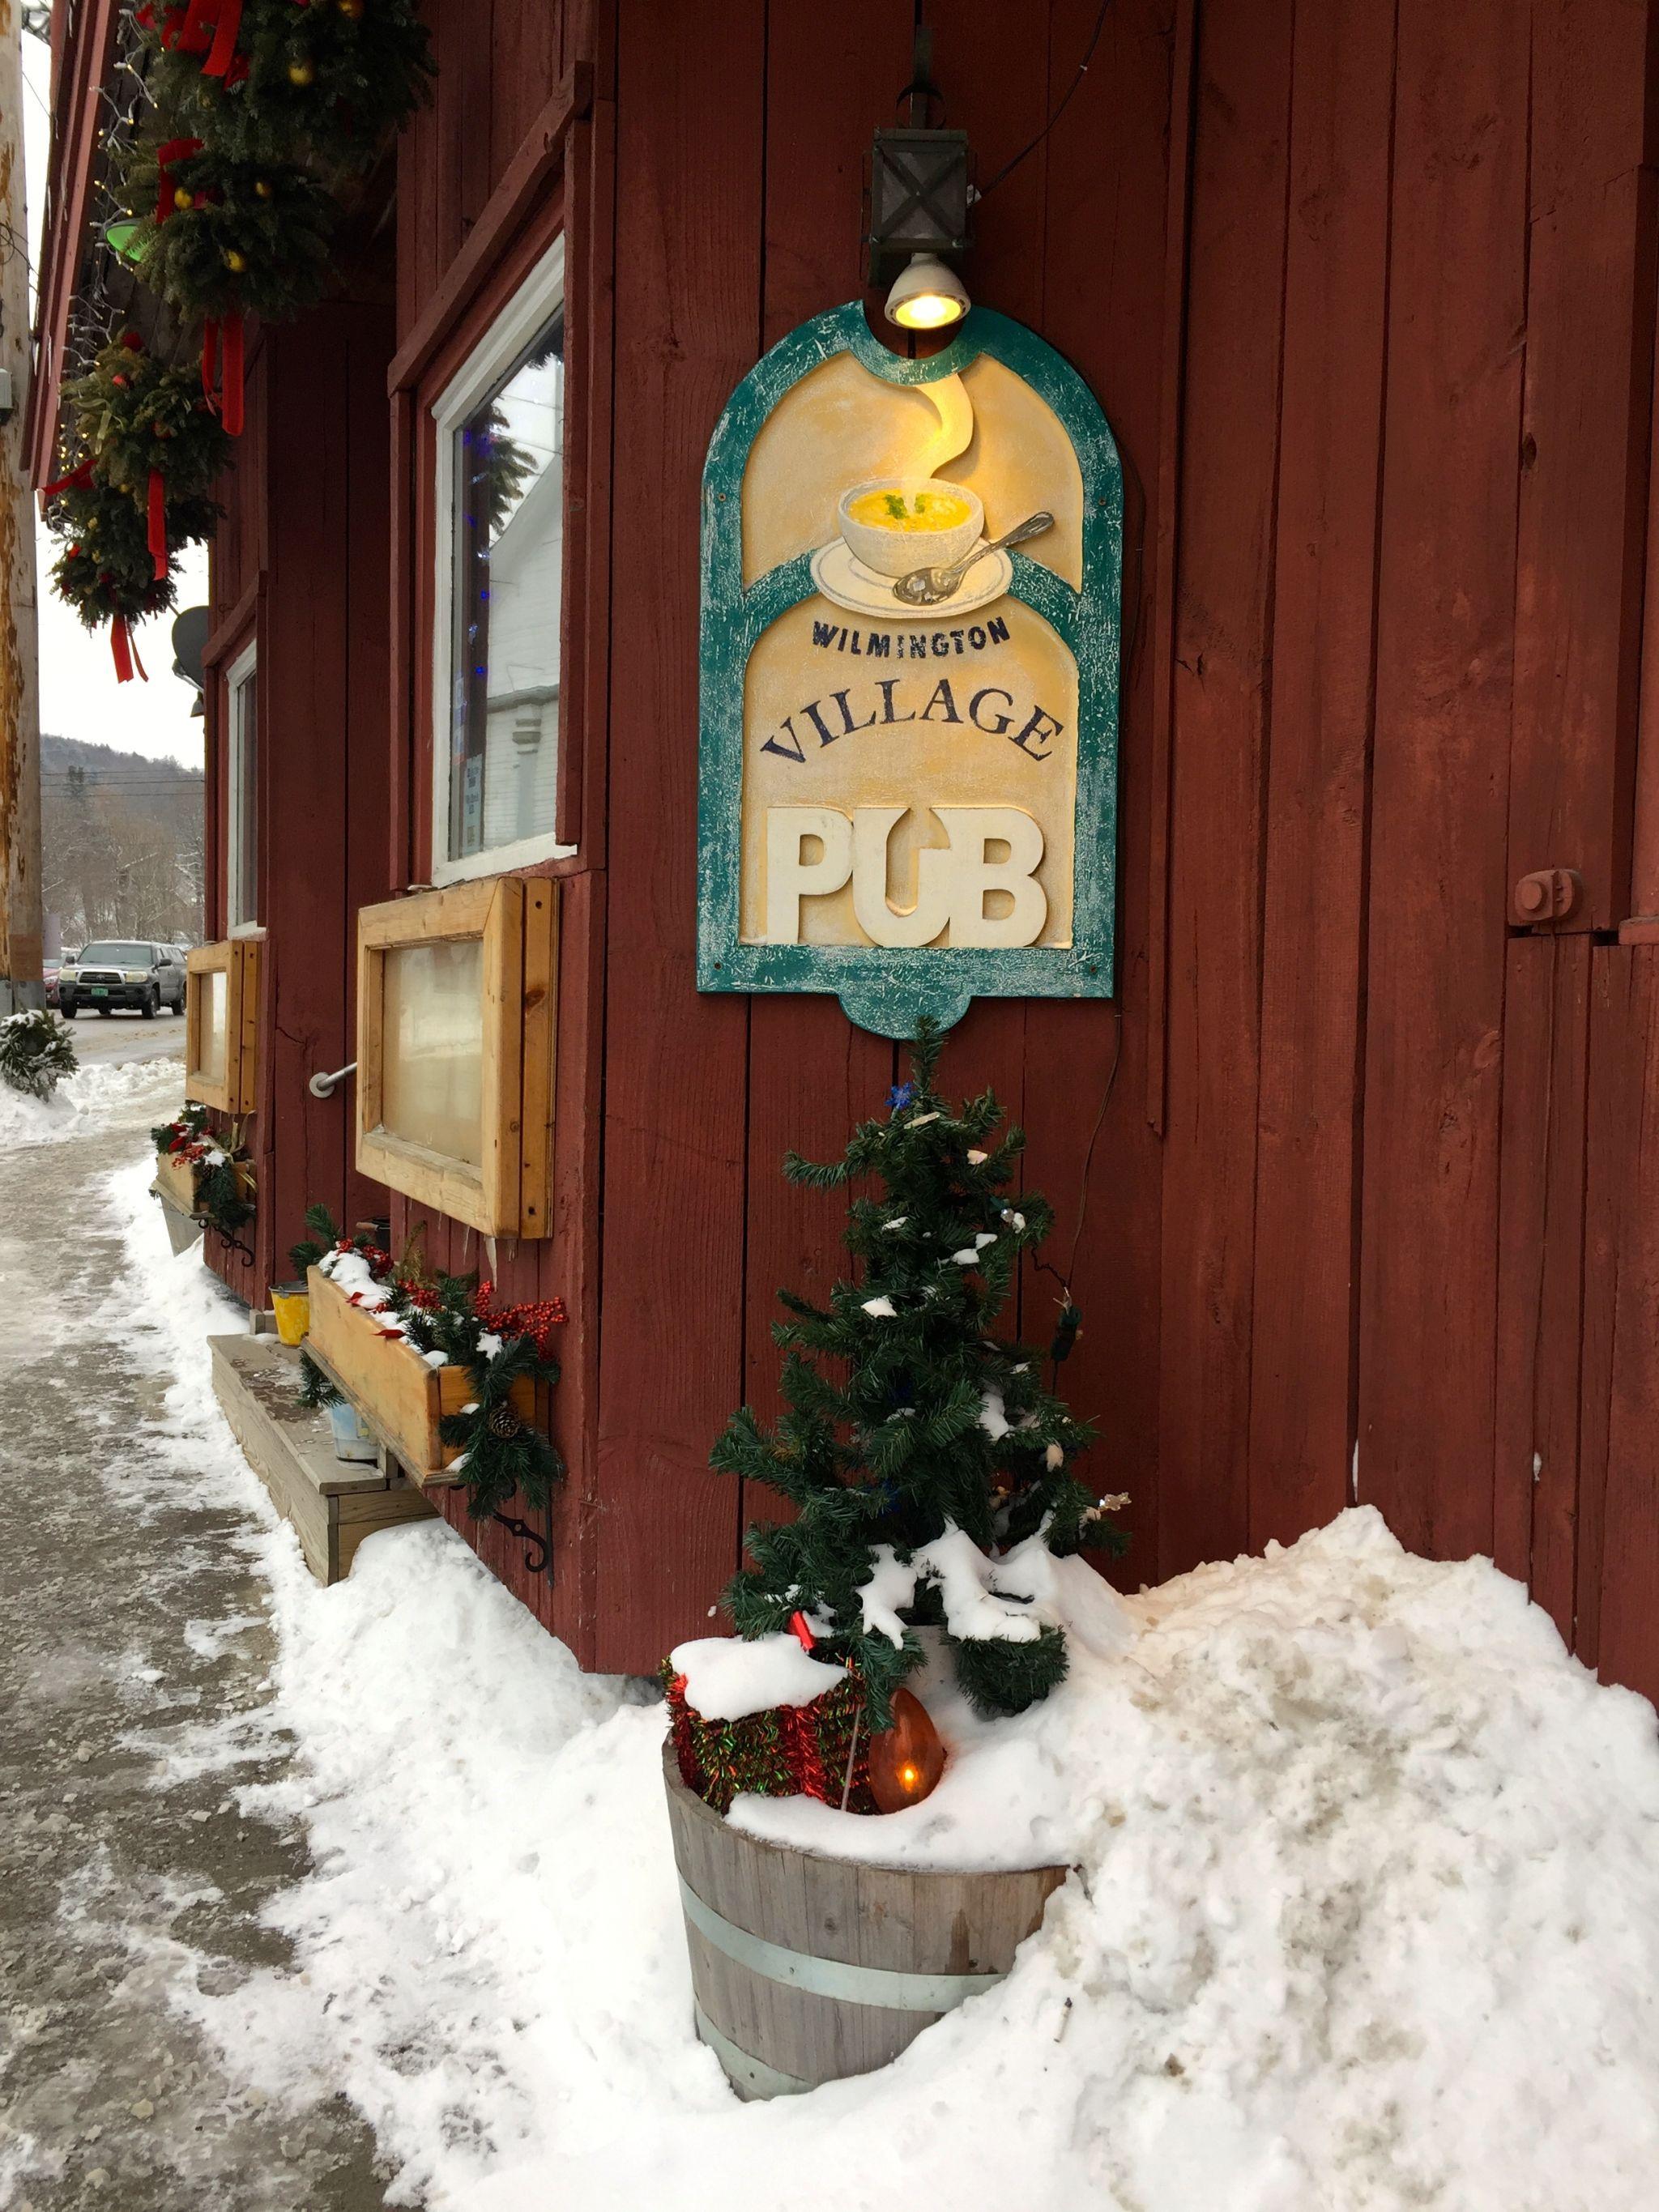 Pub laden with snow in Wilmington Vermont